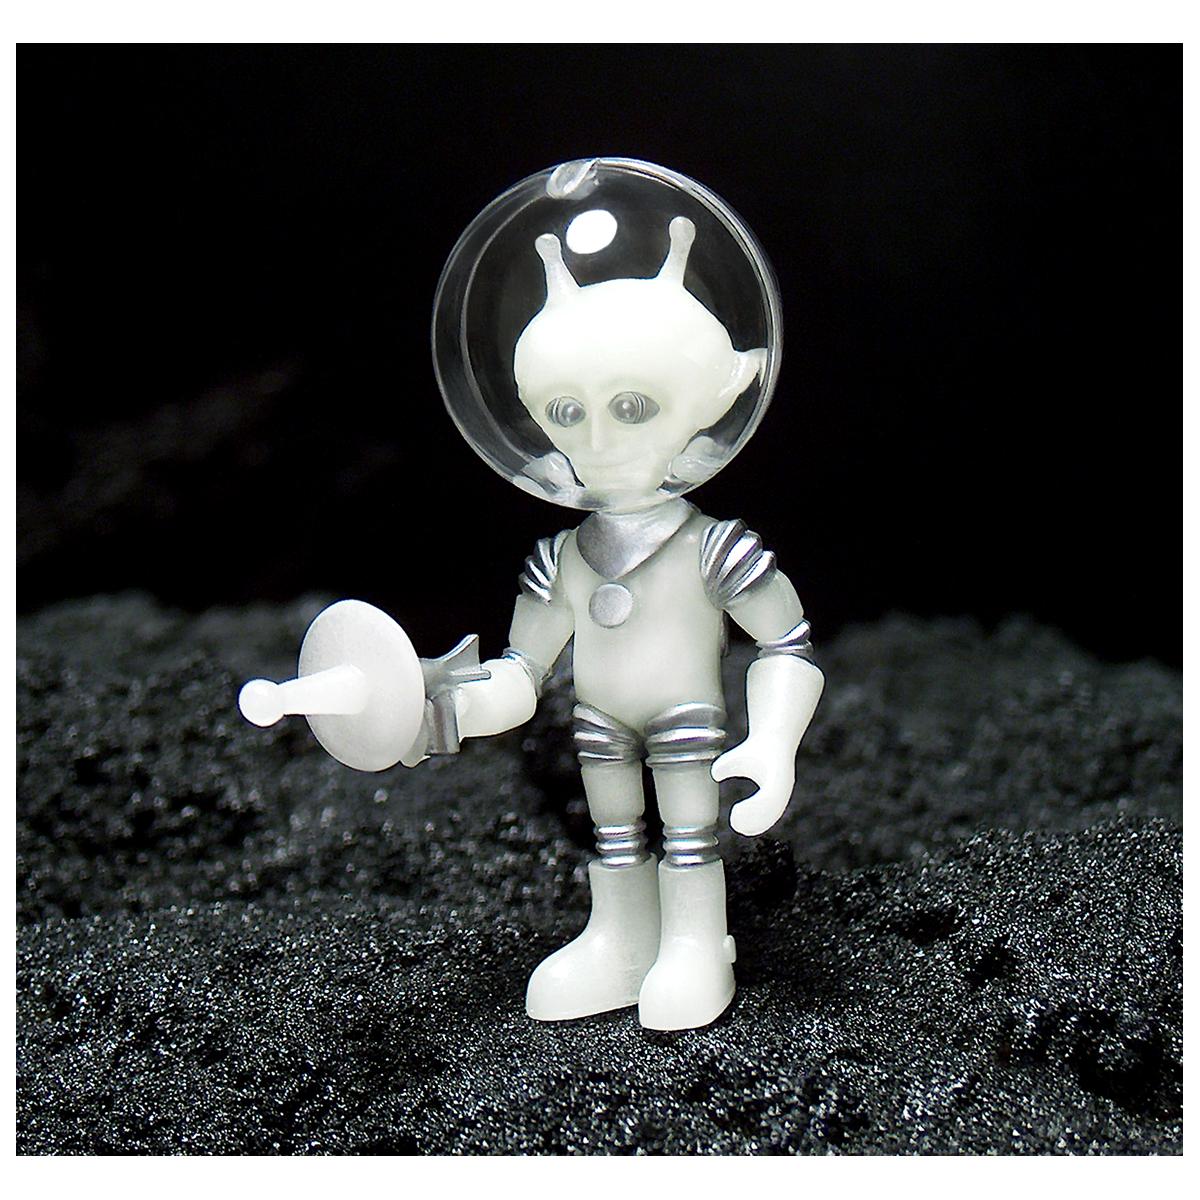 Untitled-1_0001_Alpha-7-Cosmic-Radiation-WEB-4